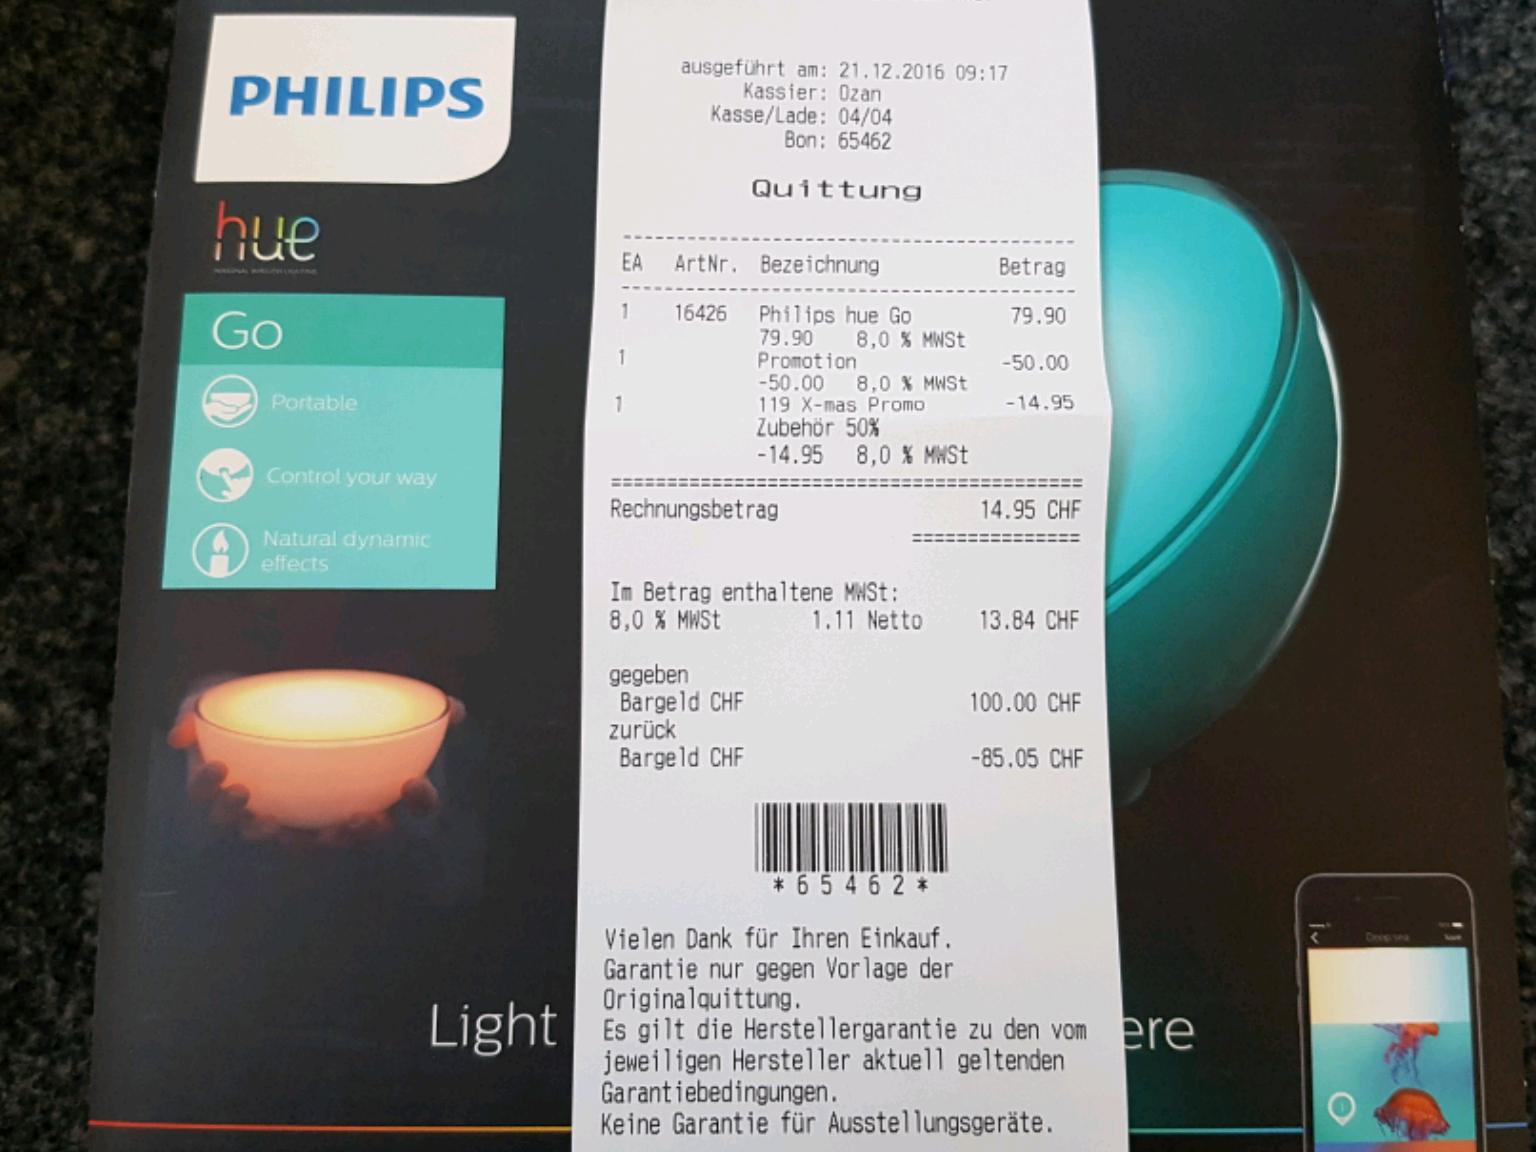 [Schweiz, Basel Stücki Shopping Center] Philips Hue Go